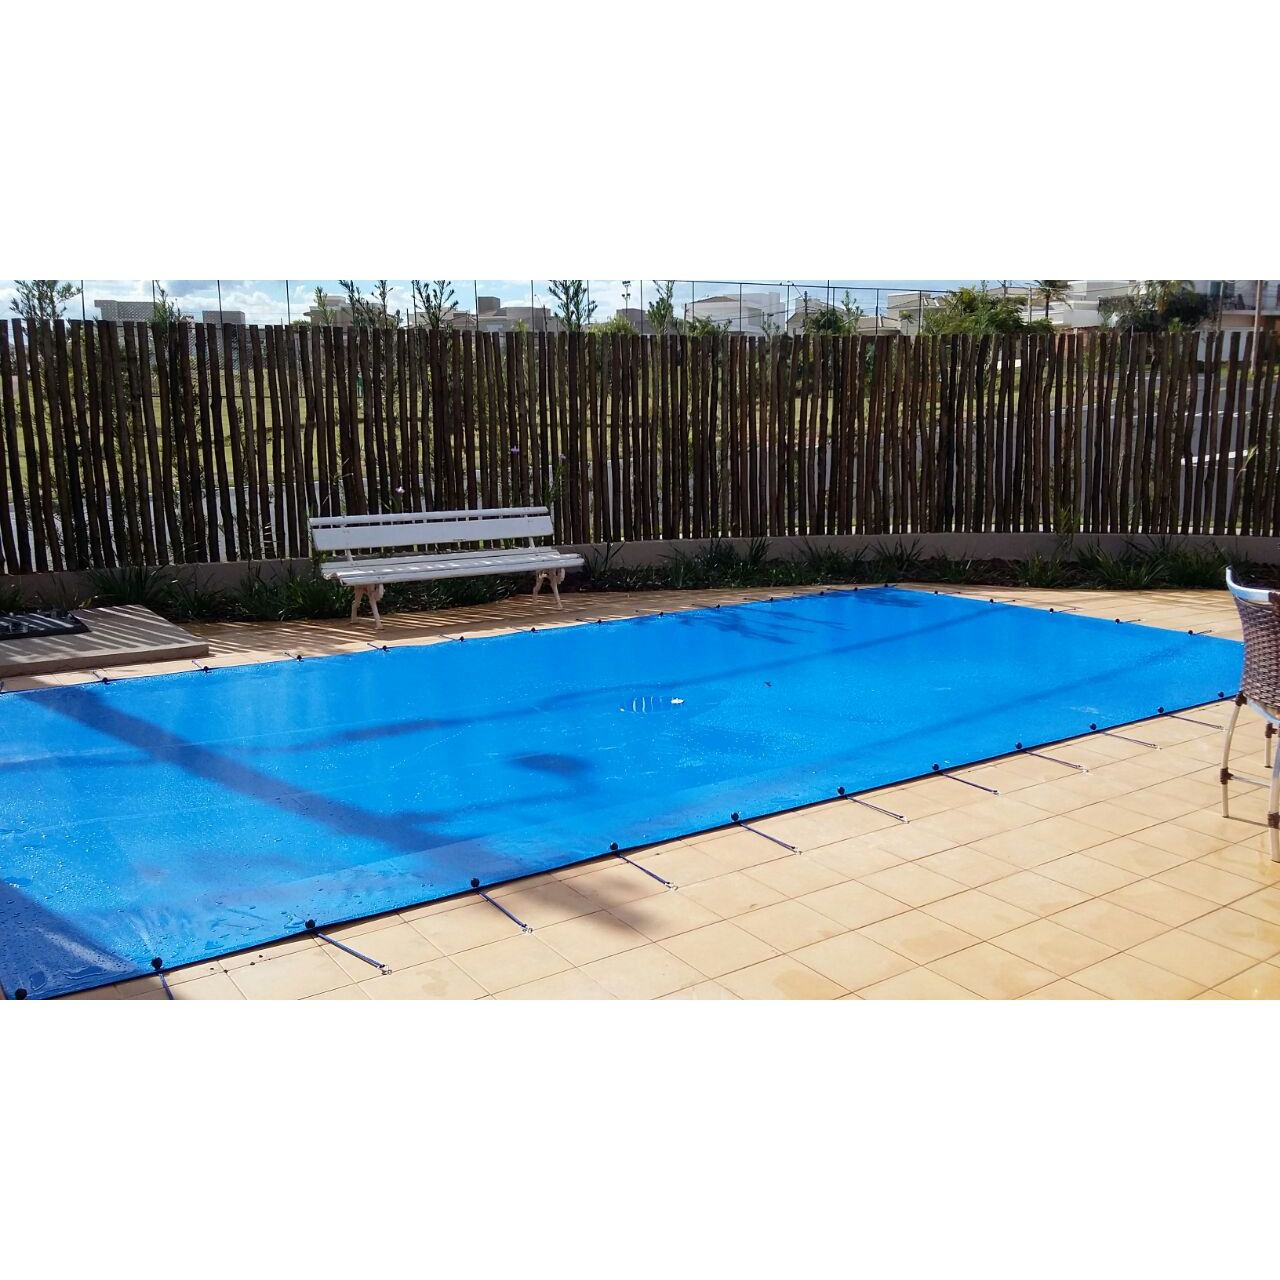 Lona Polietileno Azul 300 Micras - 7x3,5